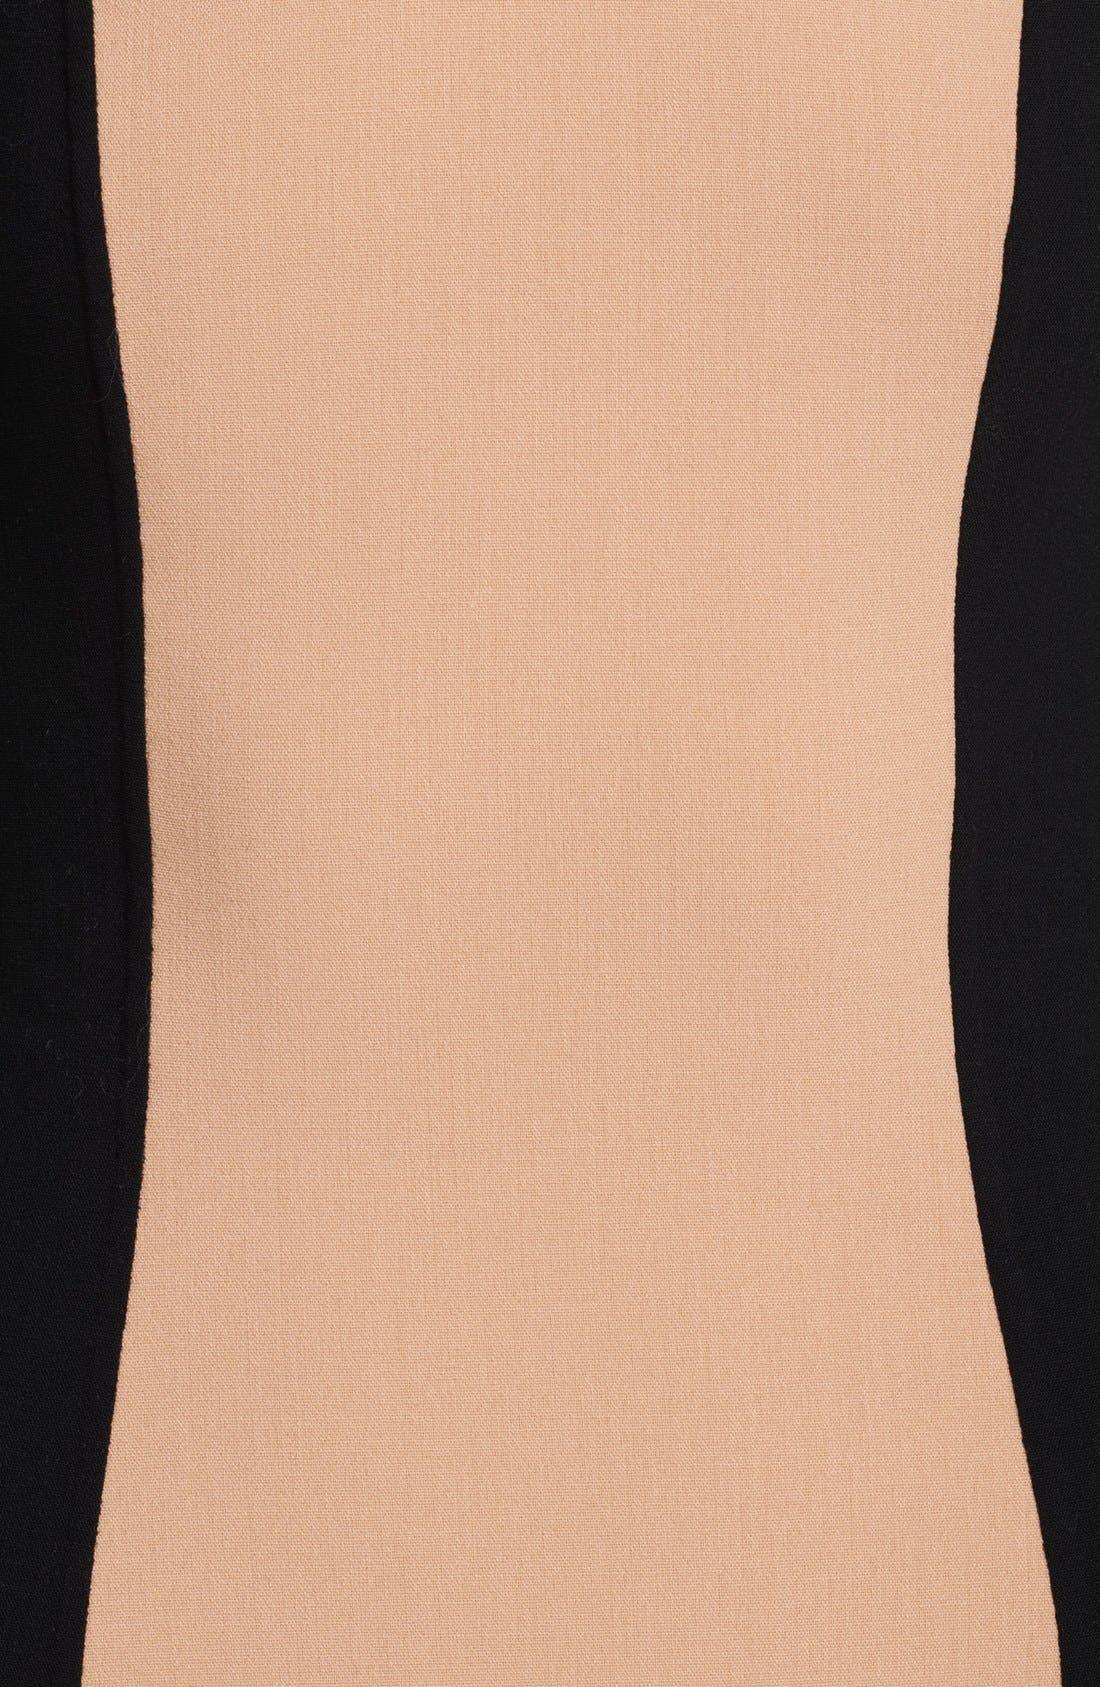 Alternate Image 2  - Michael Kors Colorblock Crepe Dress